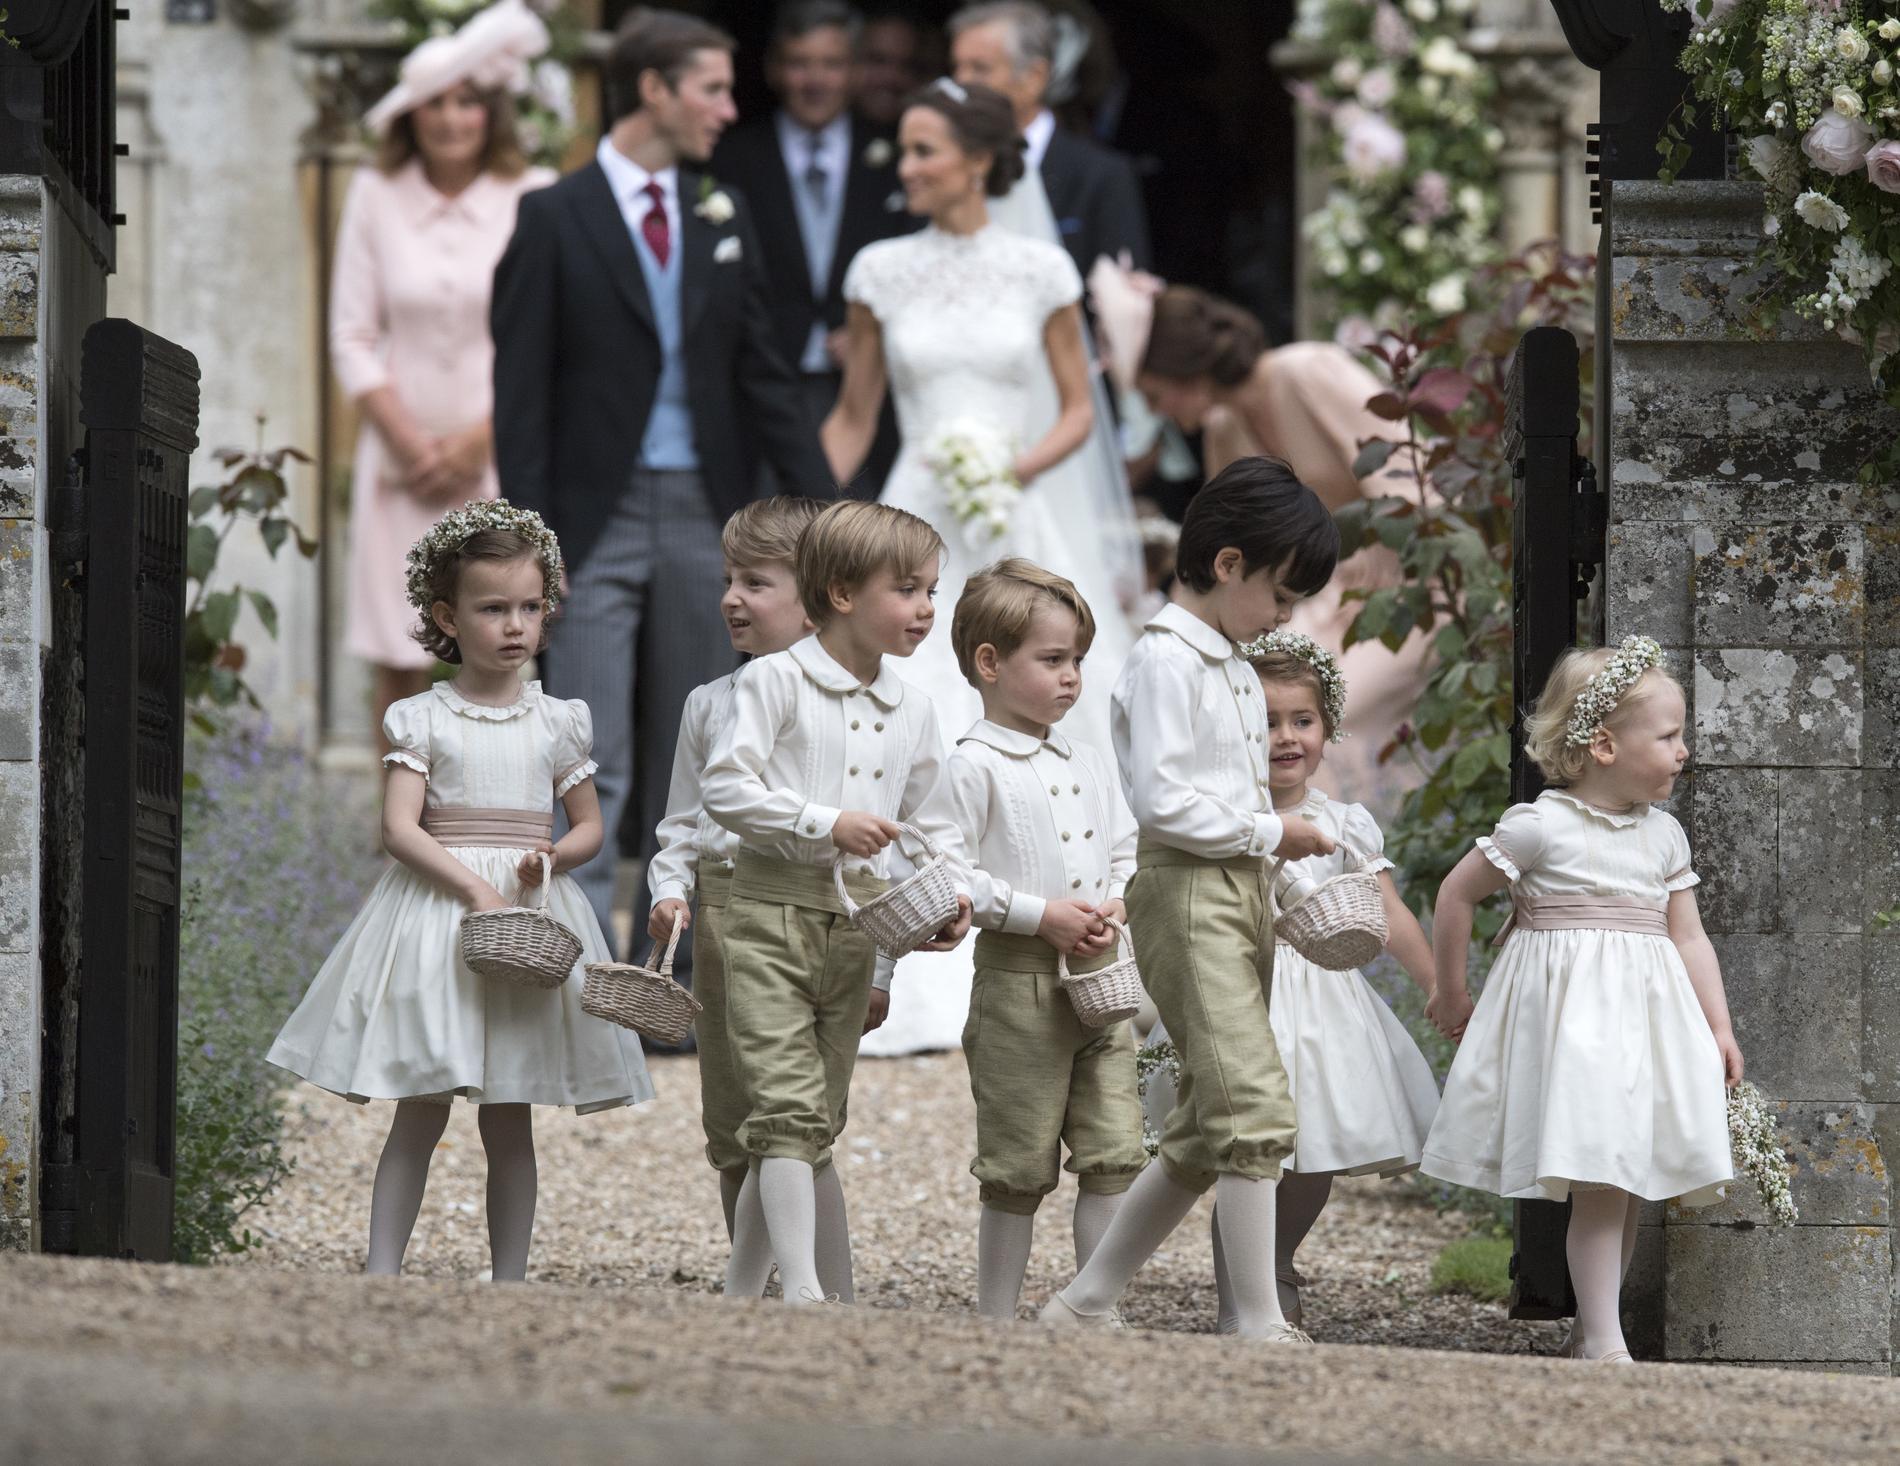 Le Mariage Presque Royal De Pippa Middleton Et James Matthews Photo 19 Princess Eugenie Wore Fun And